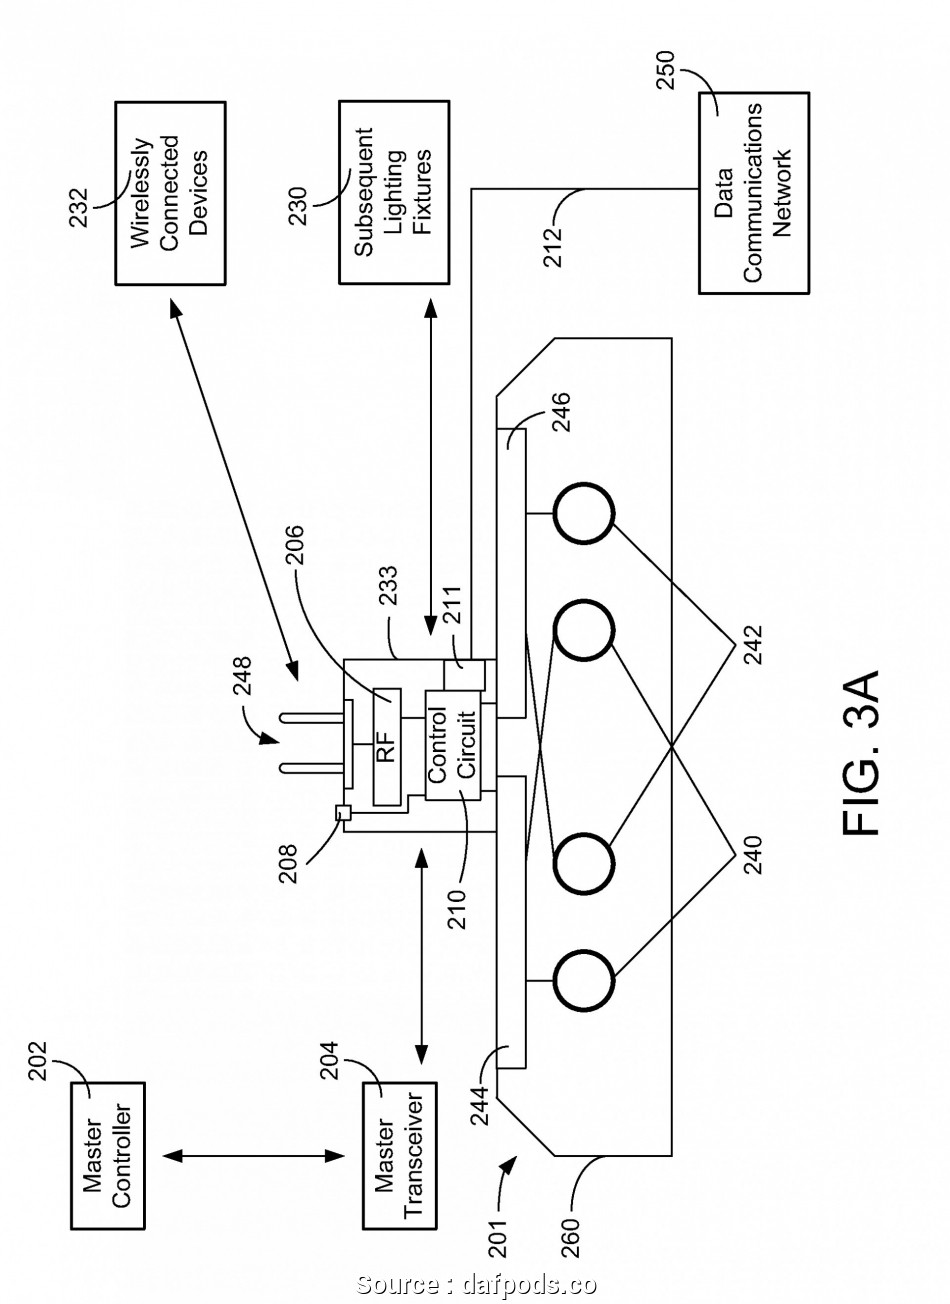 Awe Inspiring Ammcobus Lutron Cl Dimmer Switch Installation Wiring Cloud Filiciilluminateatxorg